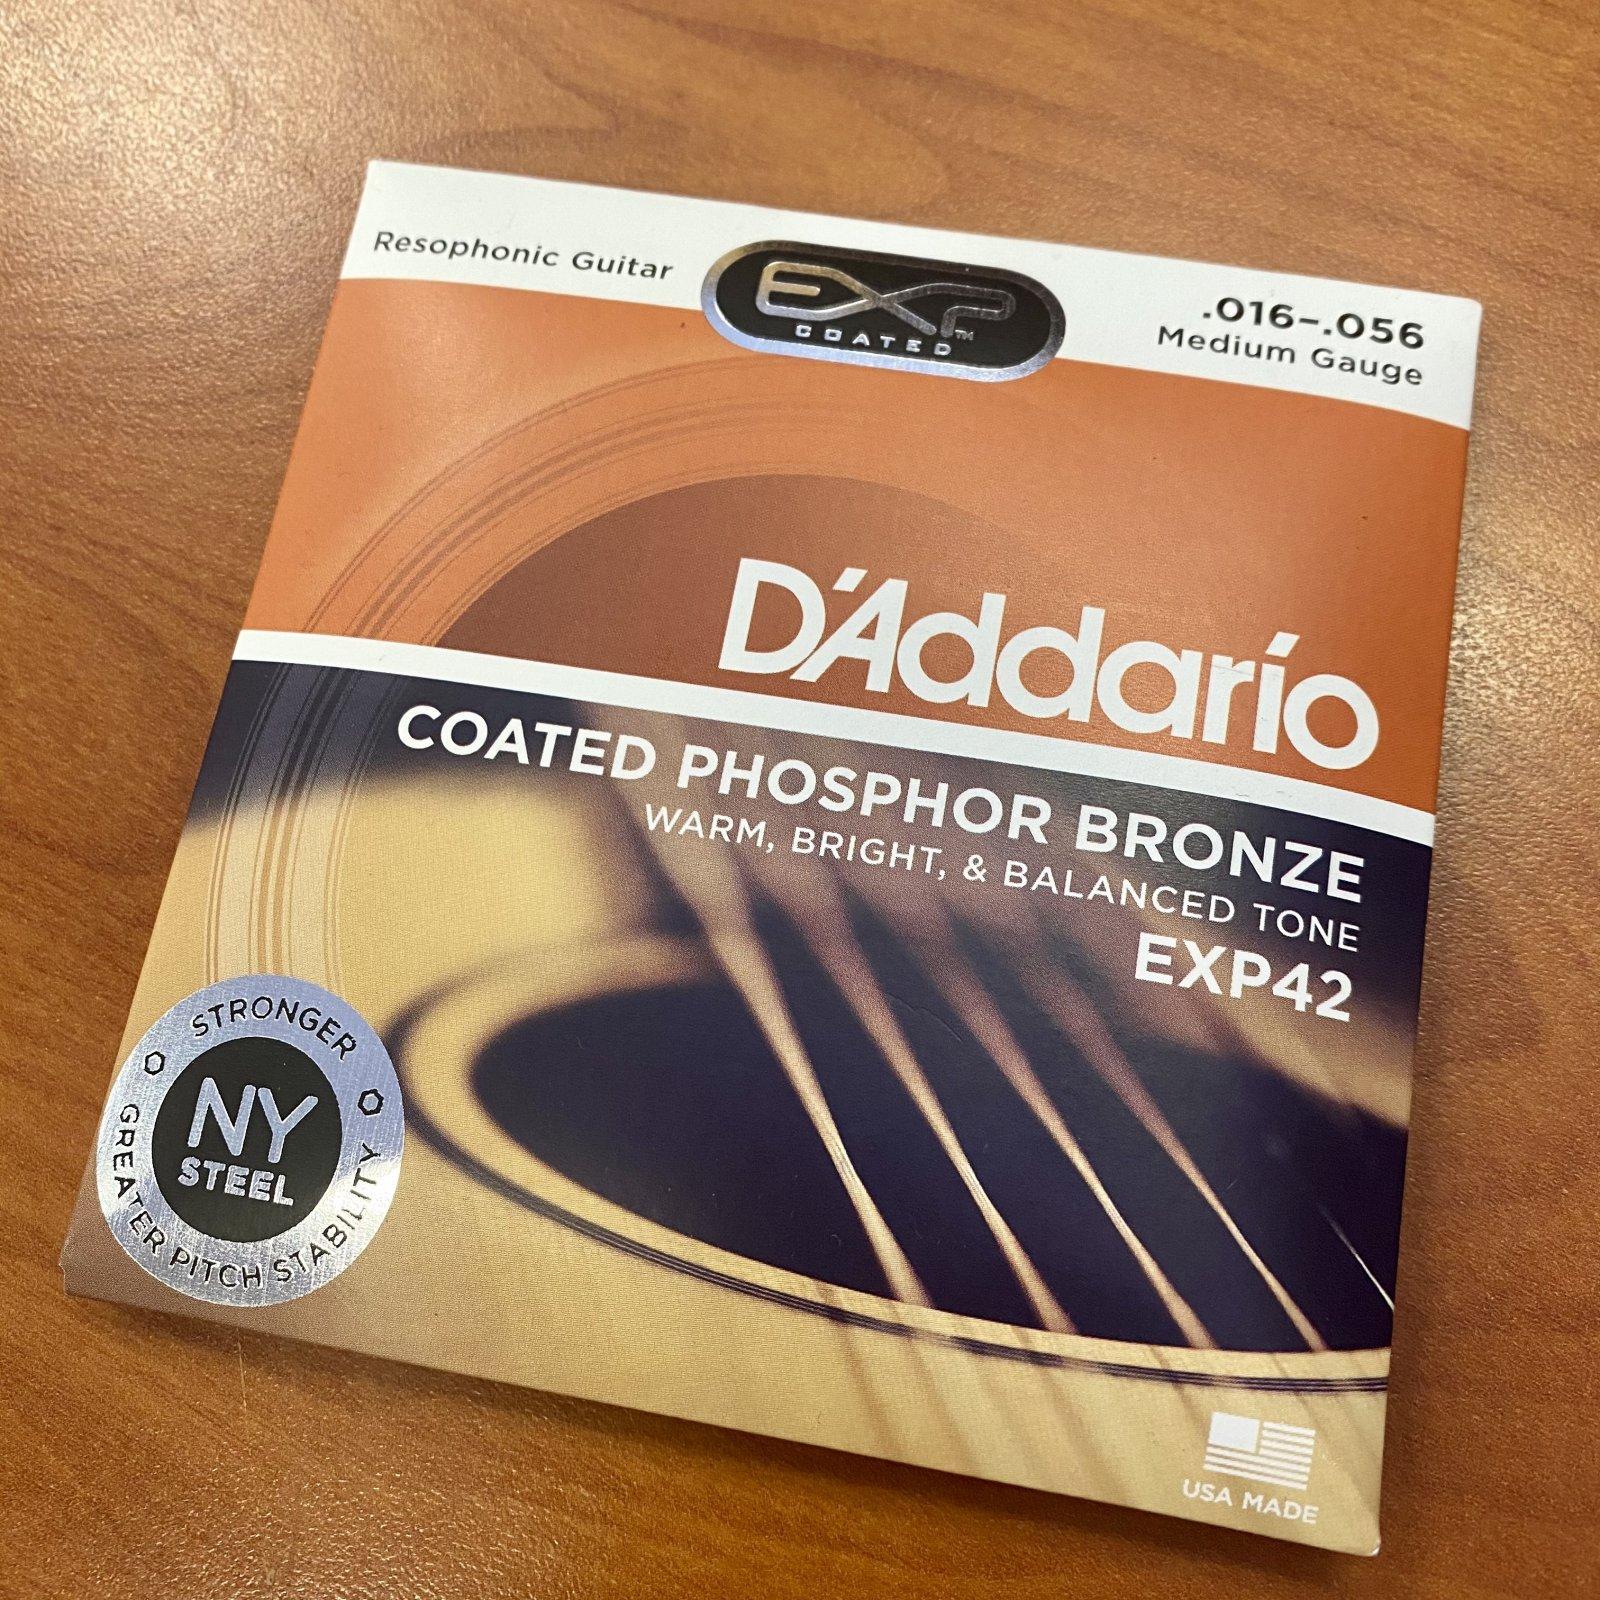 D'Addario EXP Phosphor Bronze Resophonic Guitar Strings